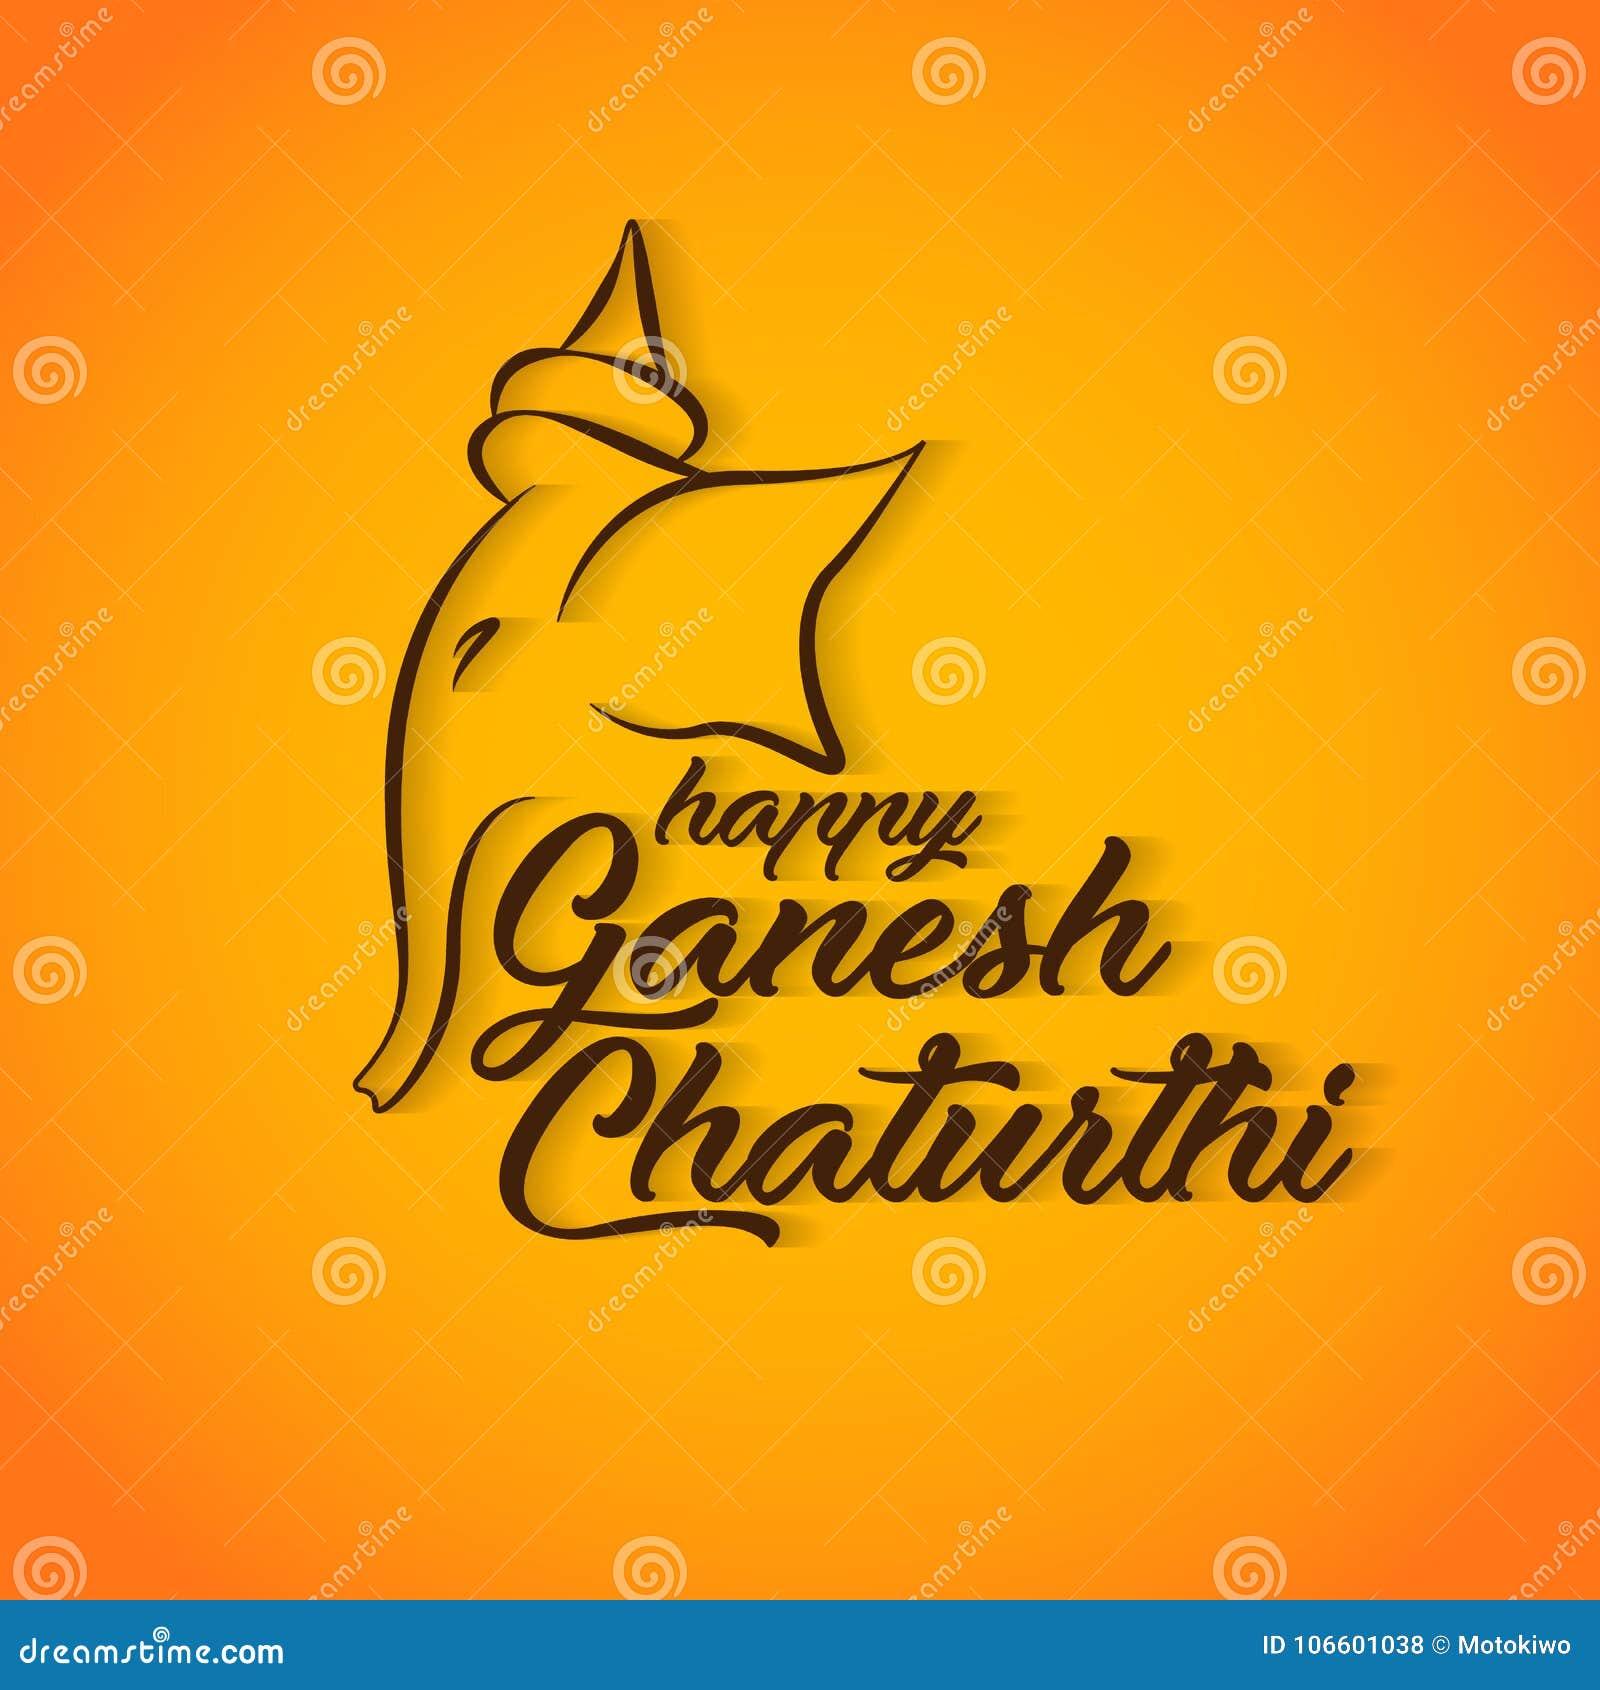 Happy Ganesh Chaturthi Greeting Card Design Stock Illustration